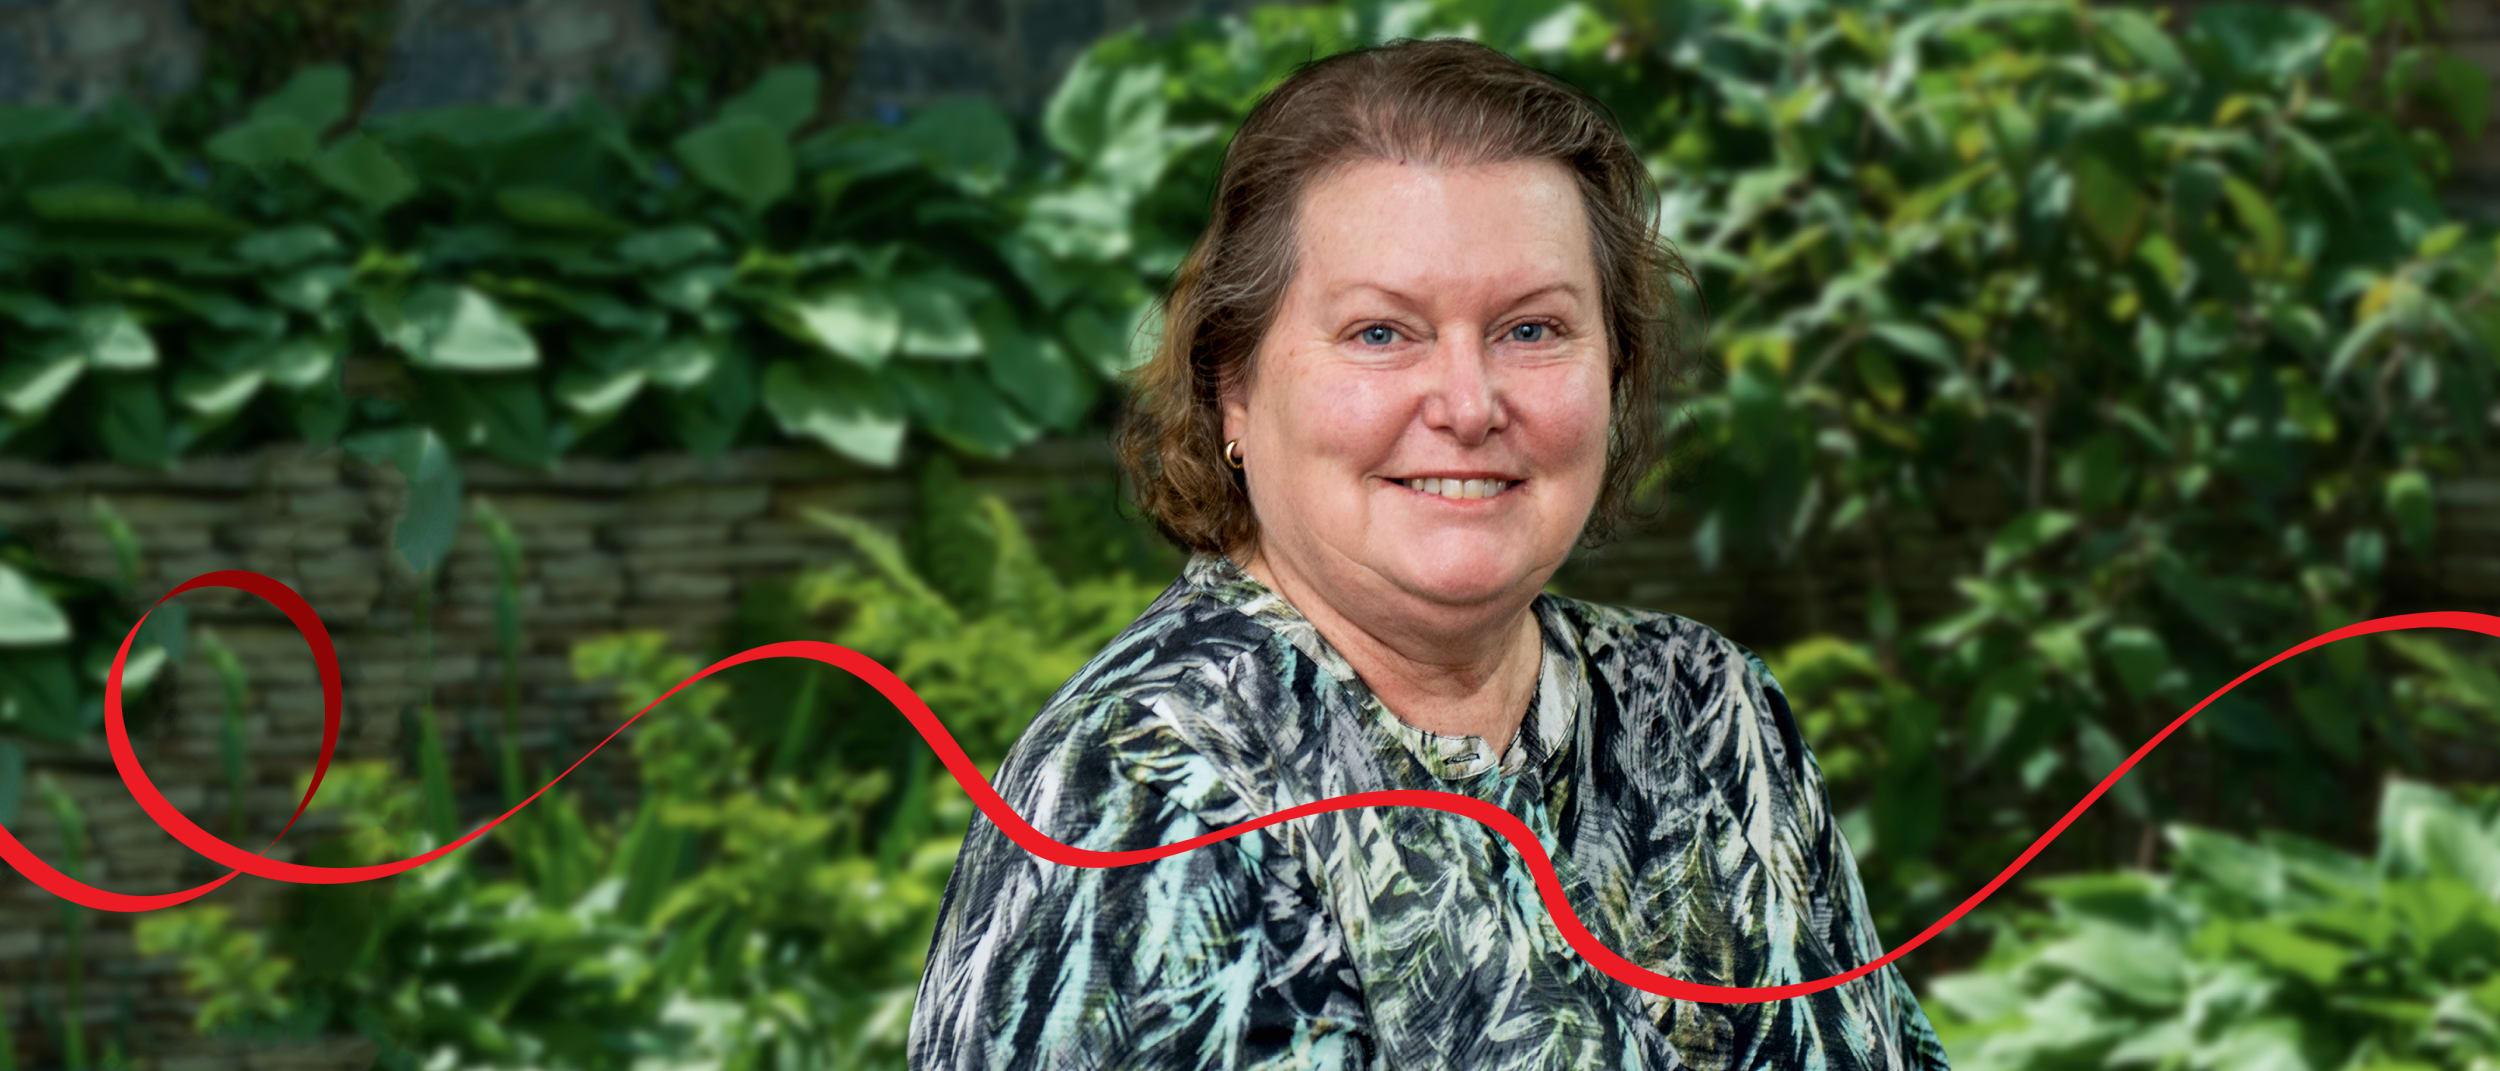 Cathy Treay: Clarke Road School